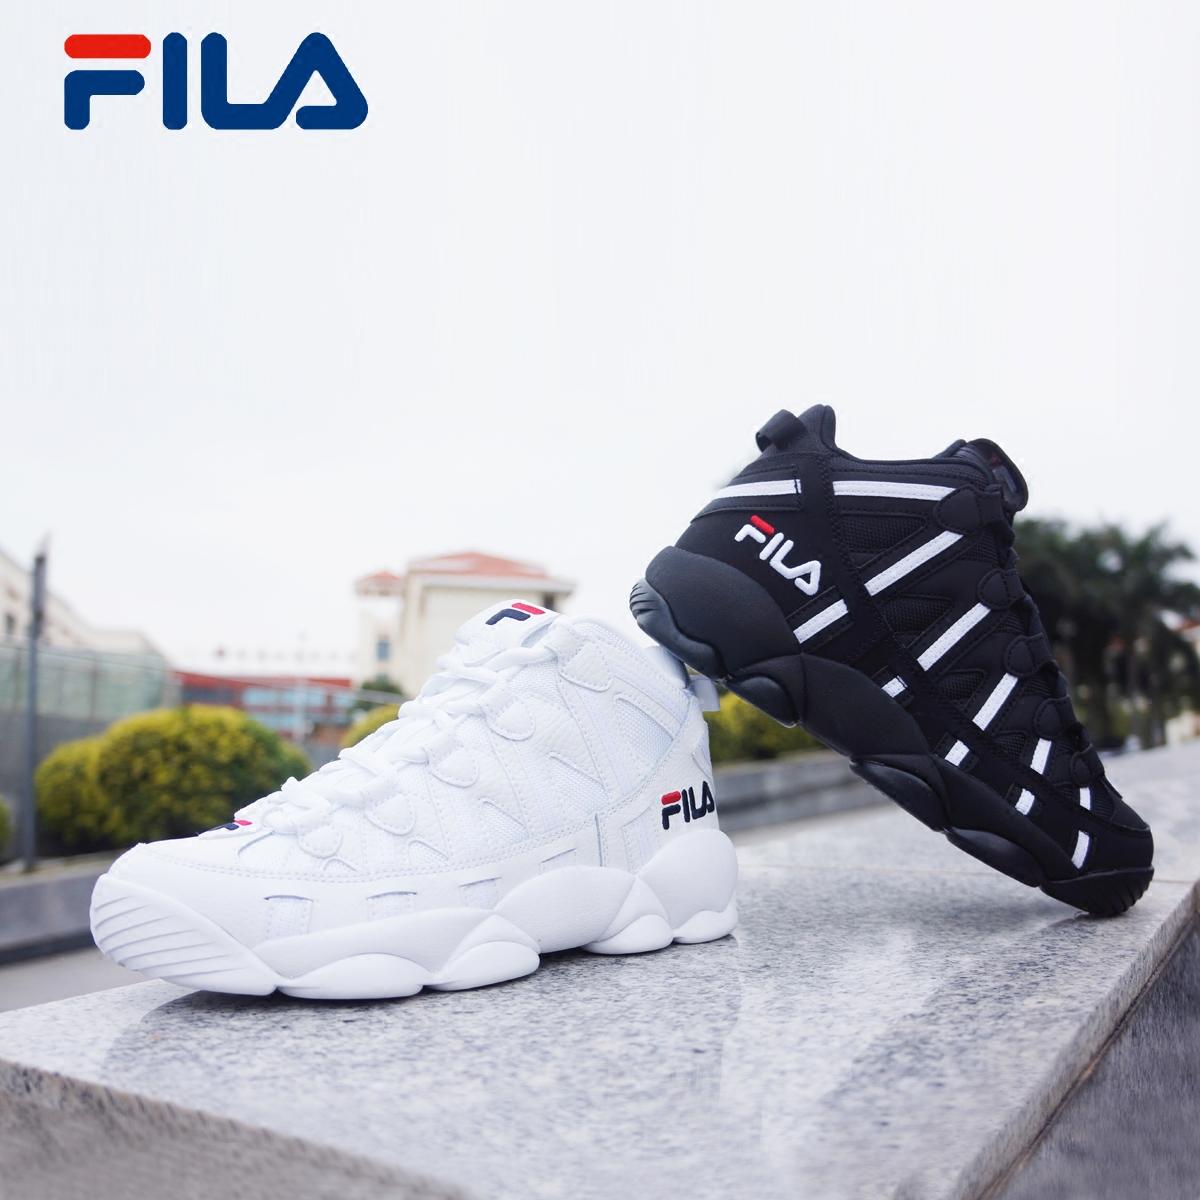 FILA斐乐BB鞋女鞋2018秋季新款经典篮球鞋运动鞋休闲鞋女